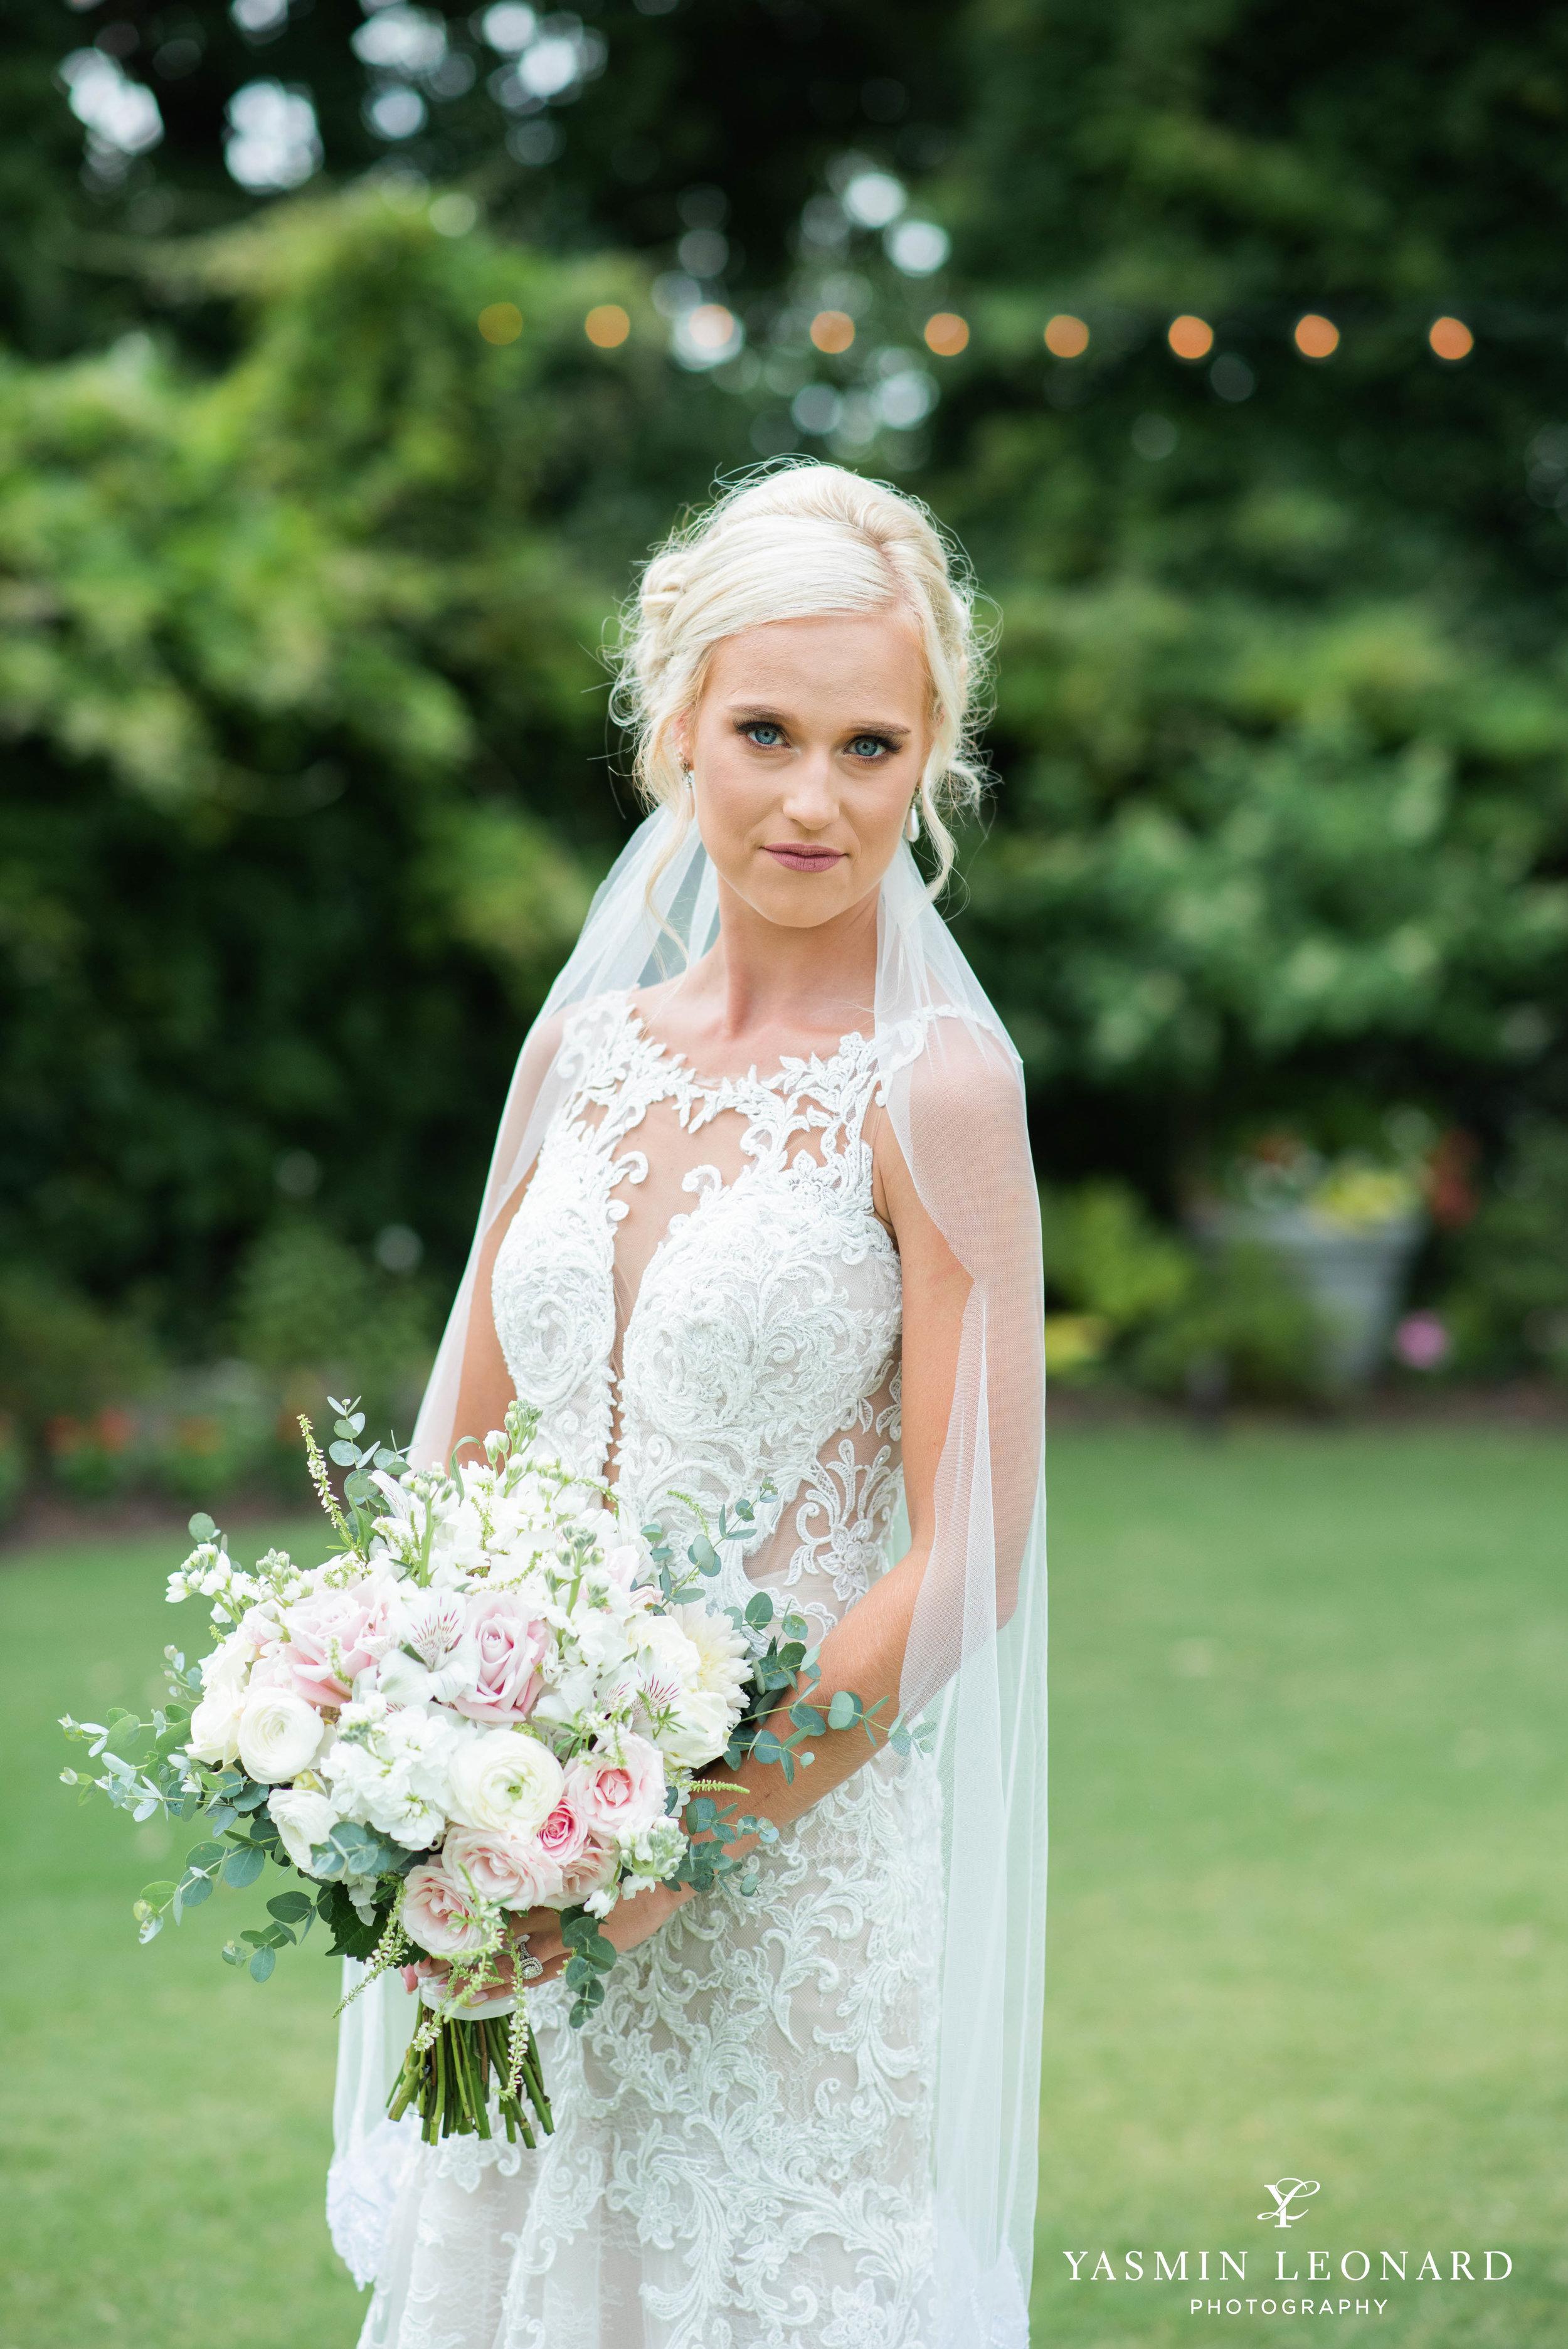 Separk Mansion - NC Weddings - Gastonia Wedding - NC Wedding Venues - Pink and Blue Wedding Ideas - Pink Bridesmaid Dresses - Yasmin Leonard Photography-10.jpg